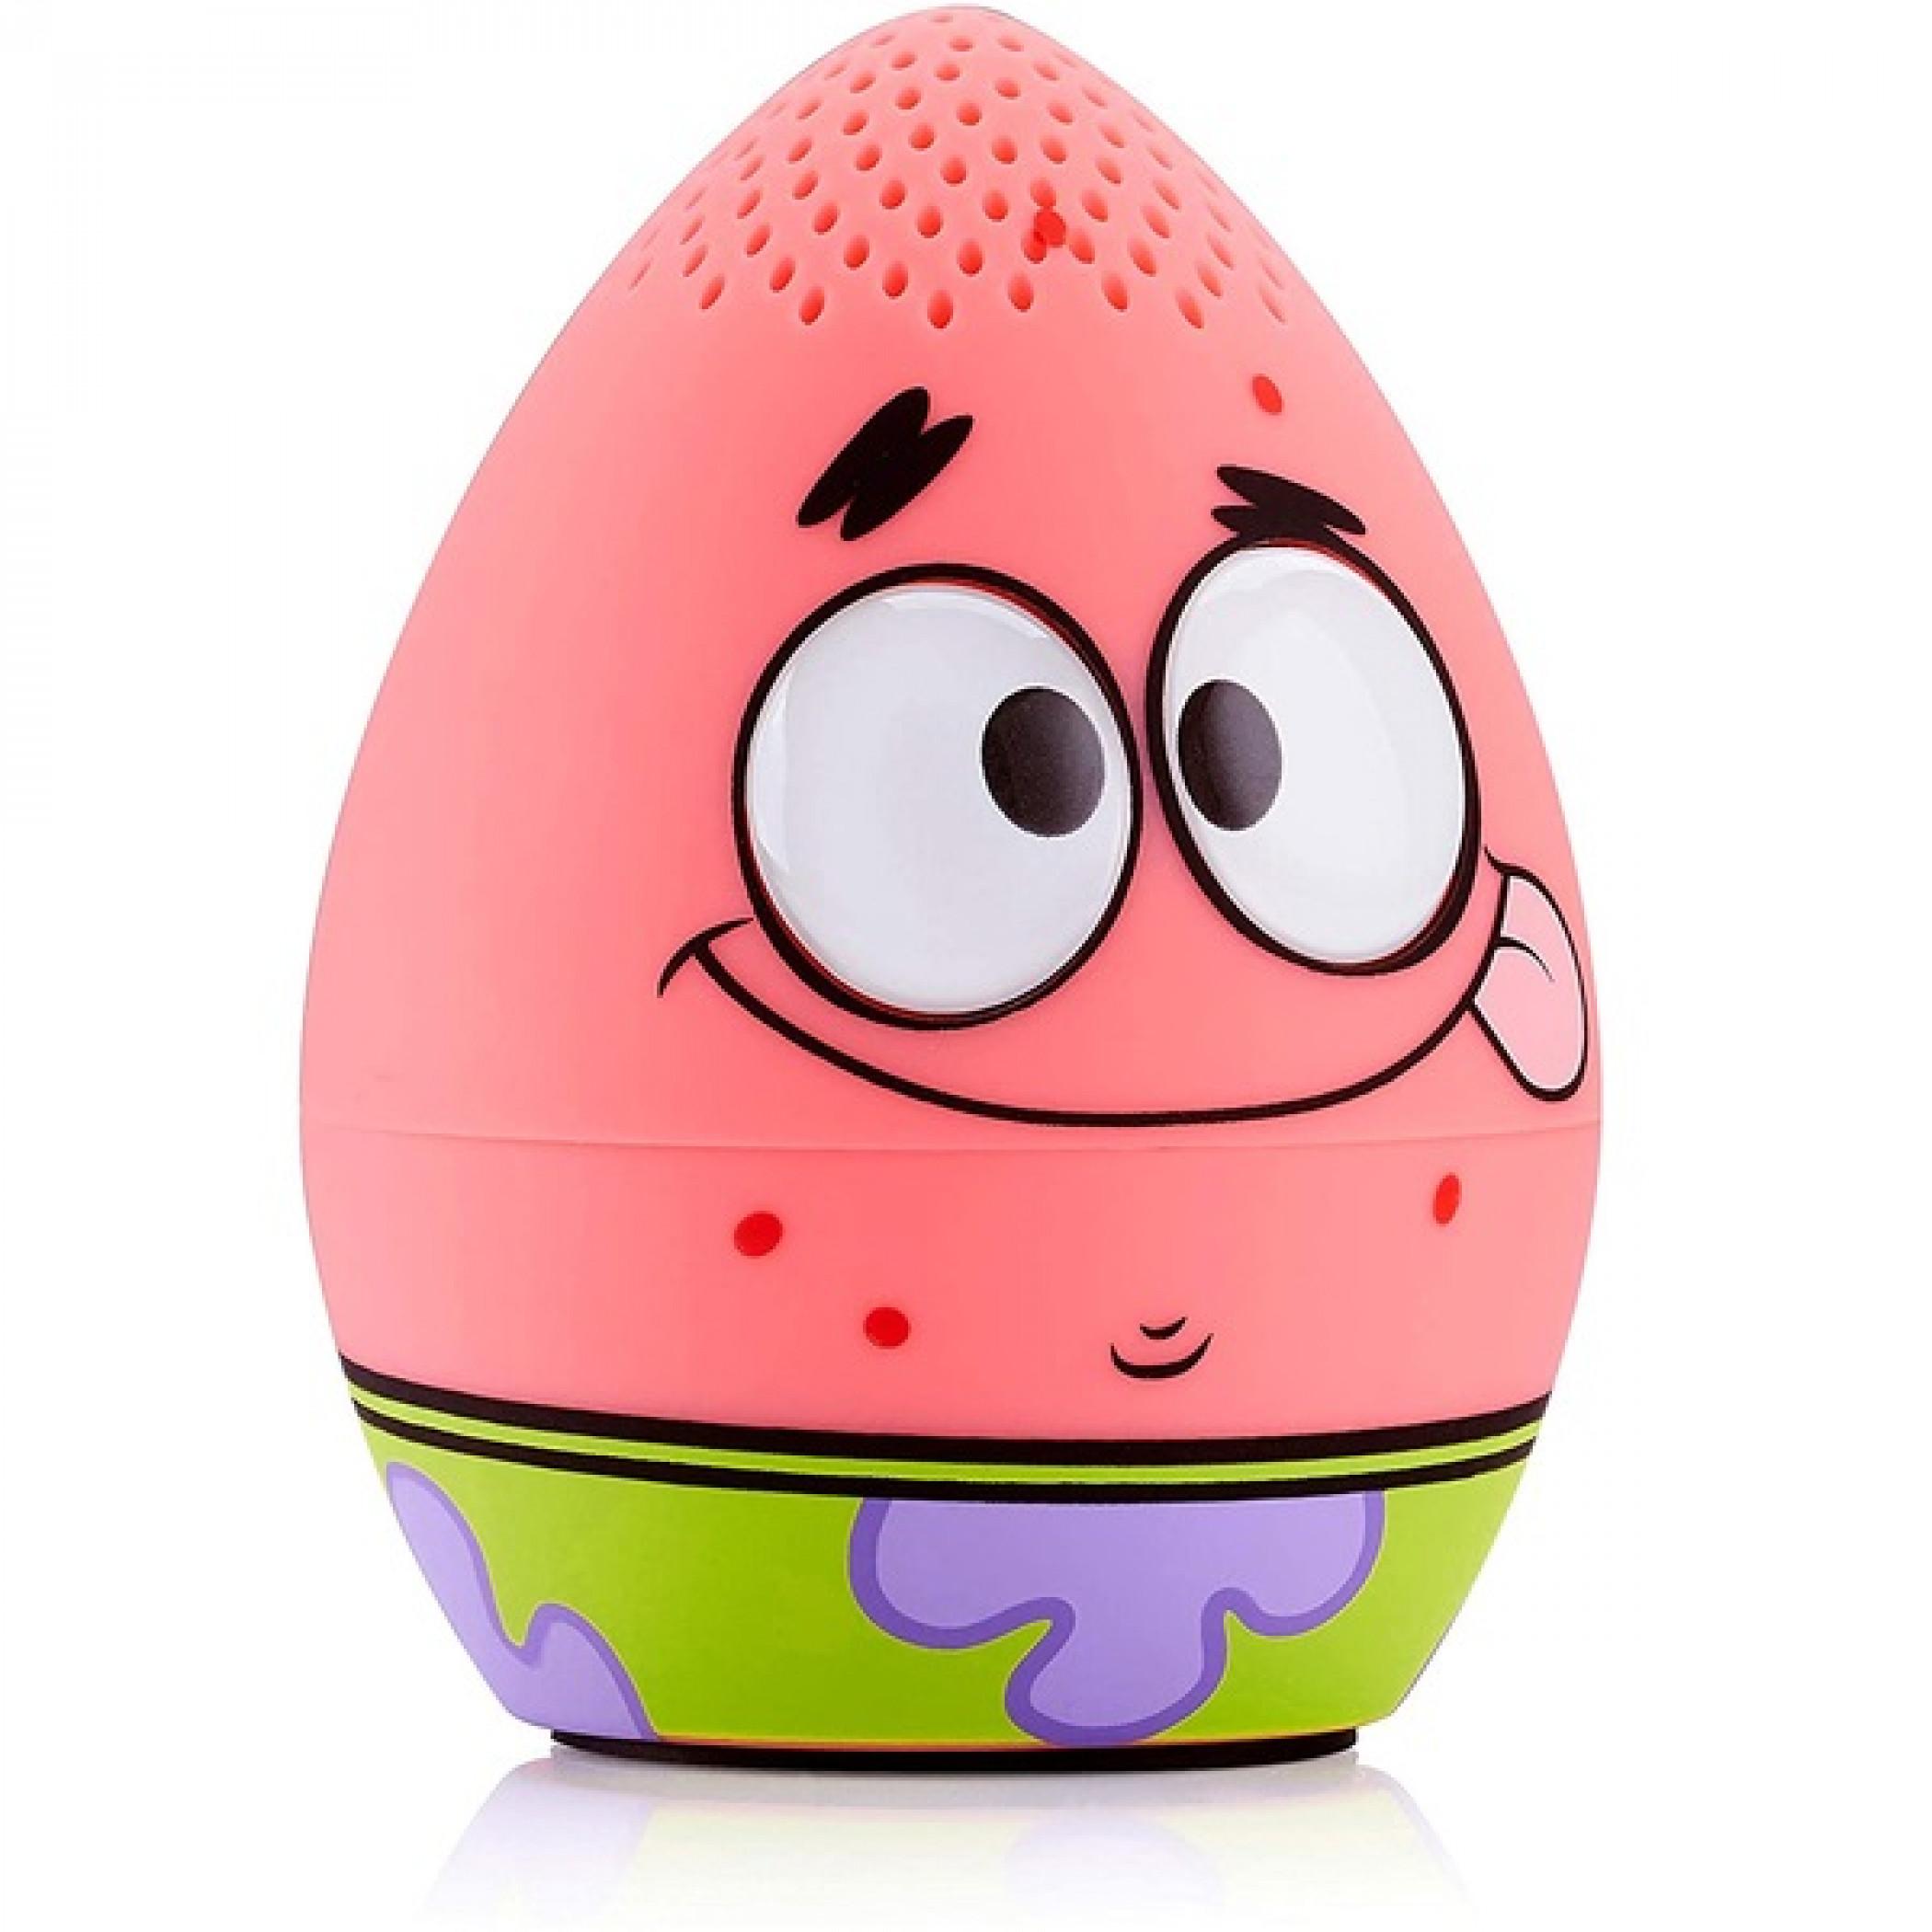 SpongeBob SquarePants Patrick Bitty Bombers Bluetooth Speaker